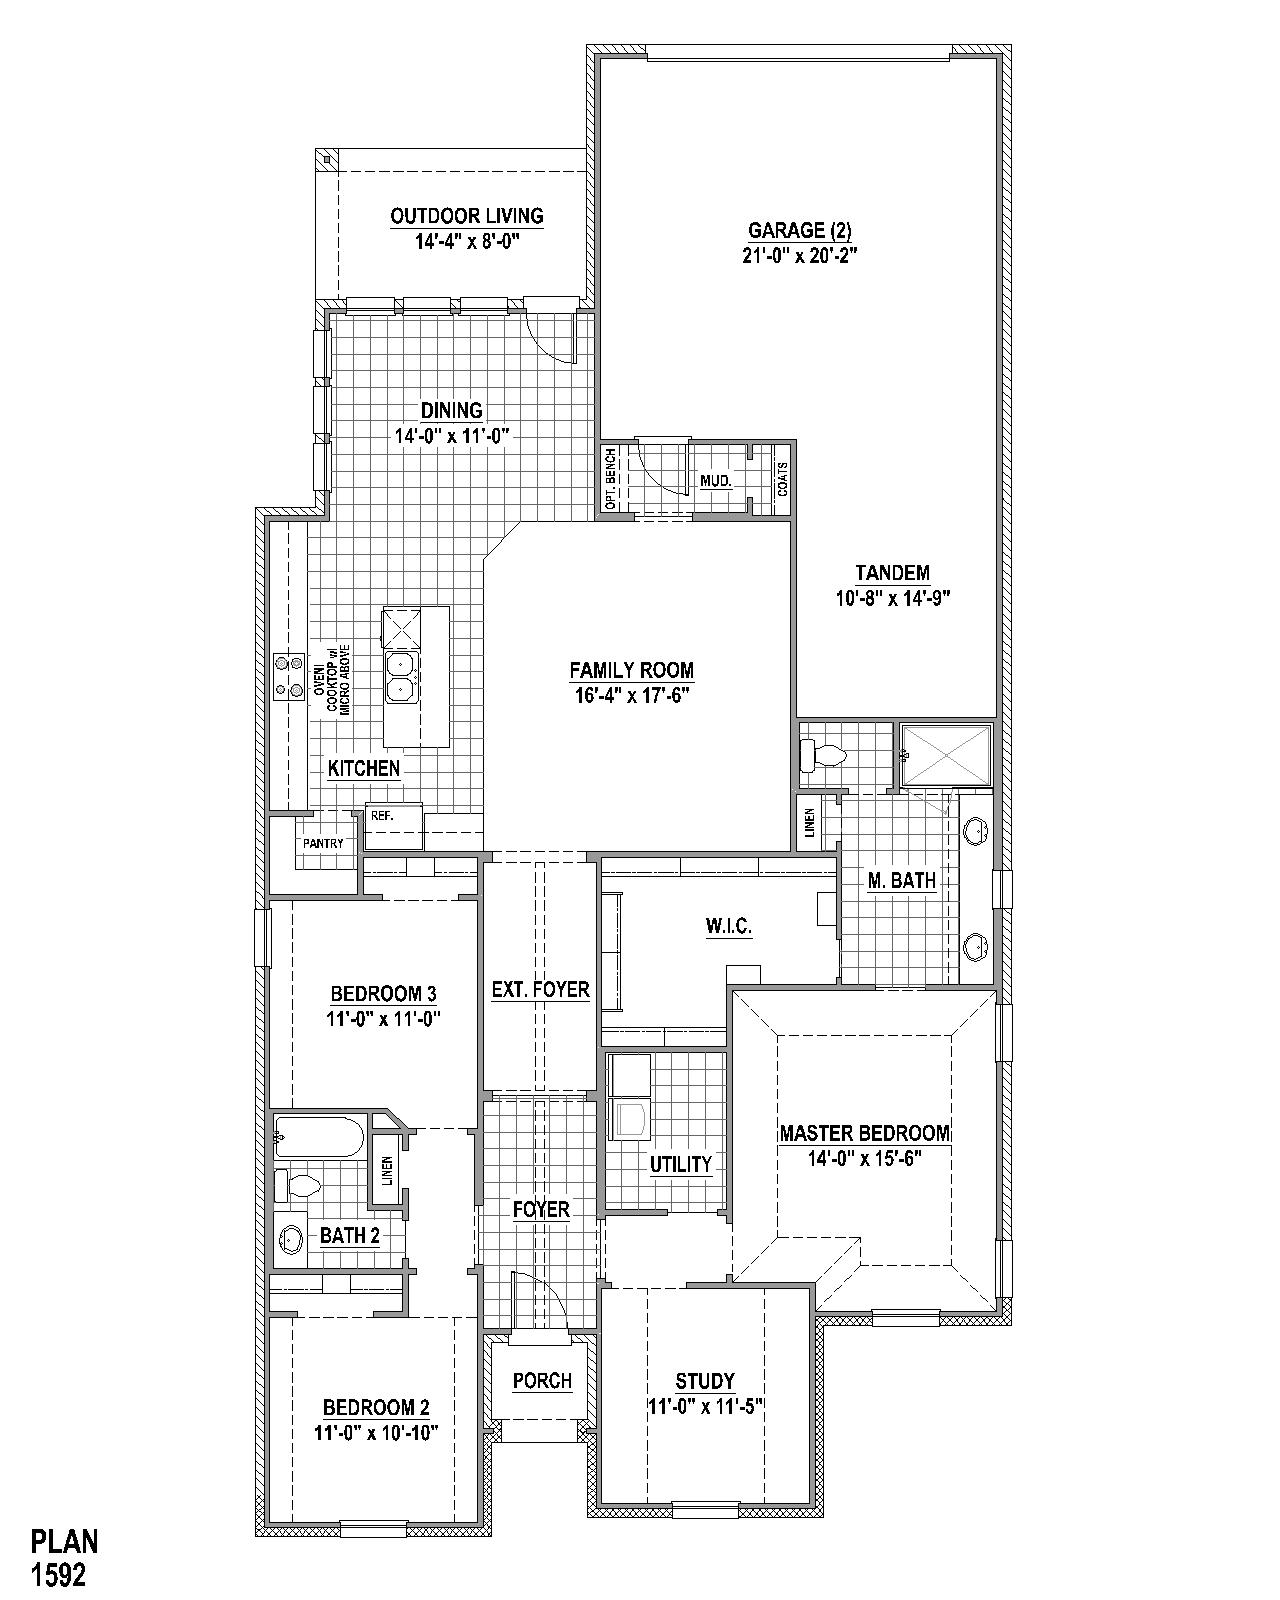 Plan 1592 Floor Plan American Legend Homes